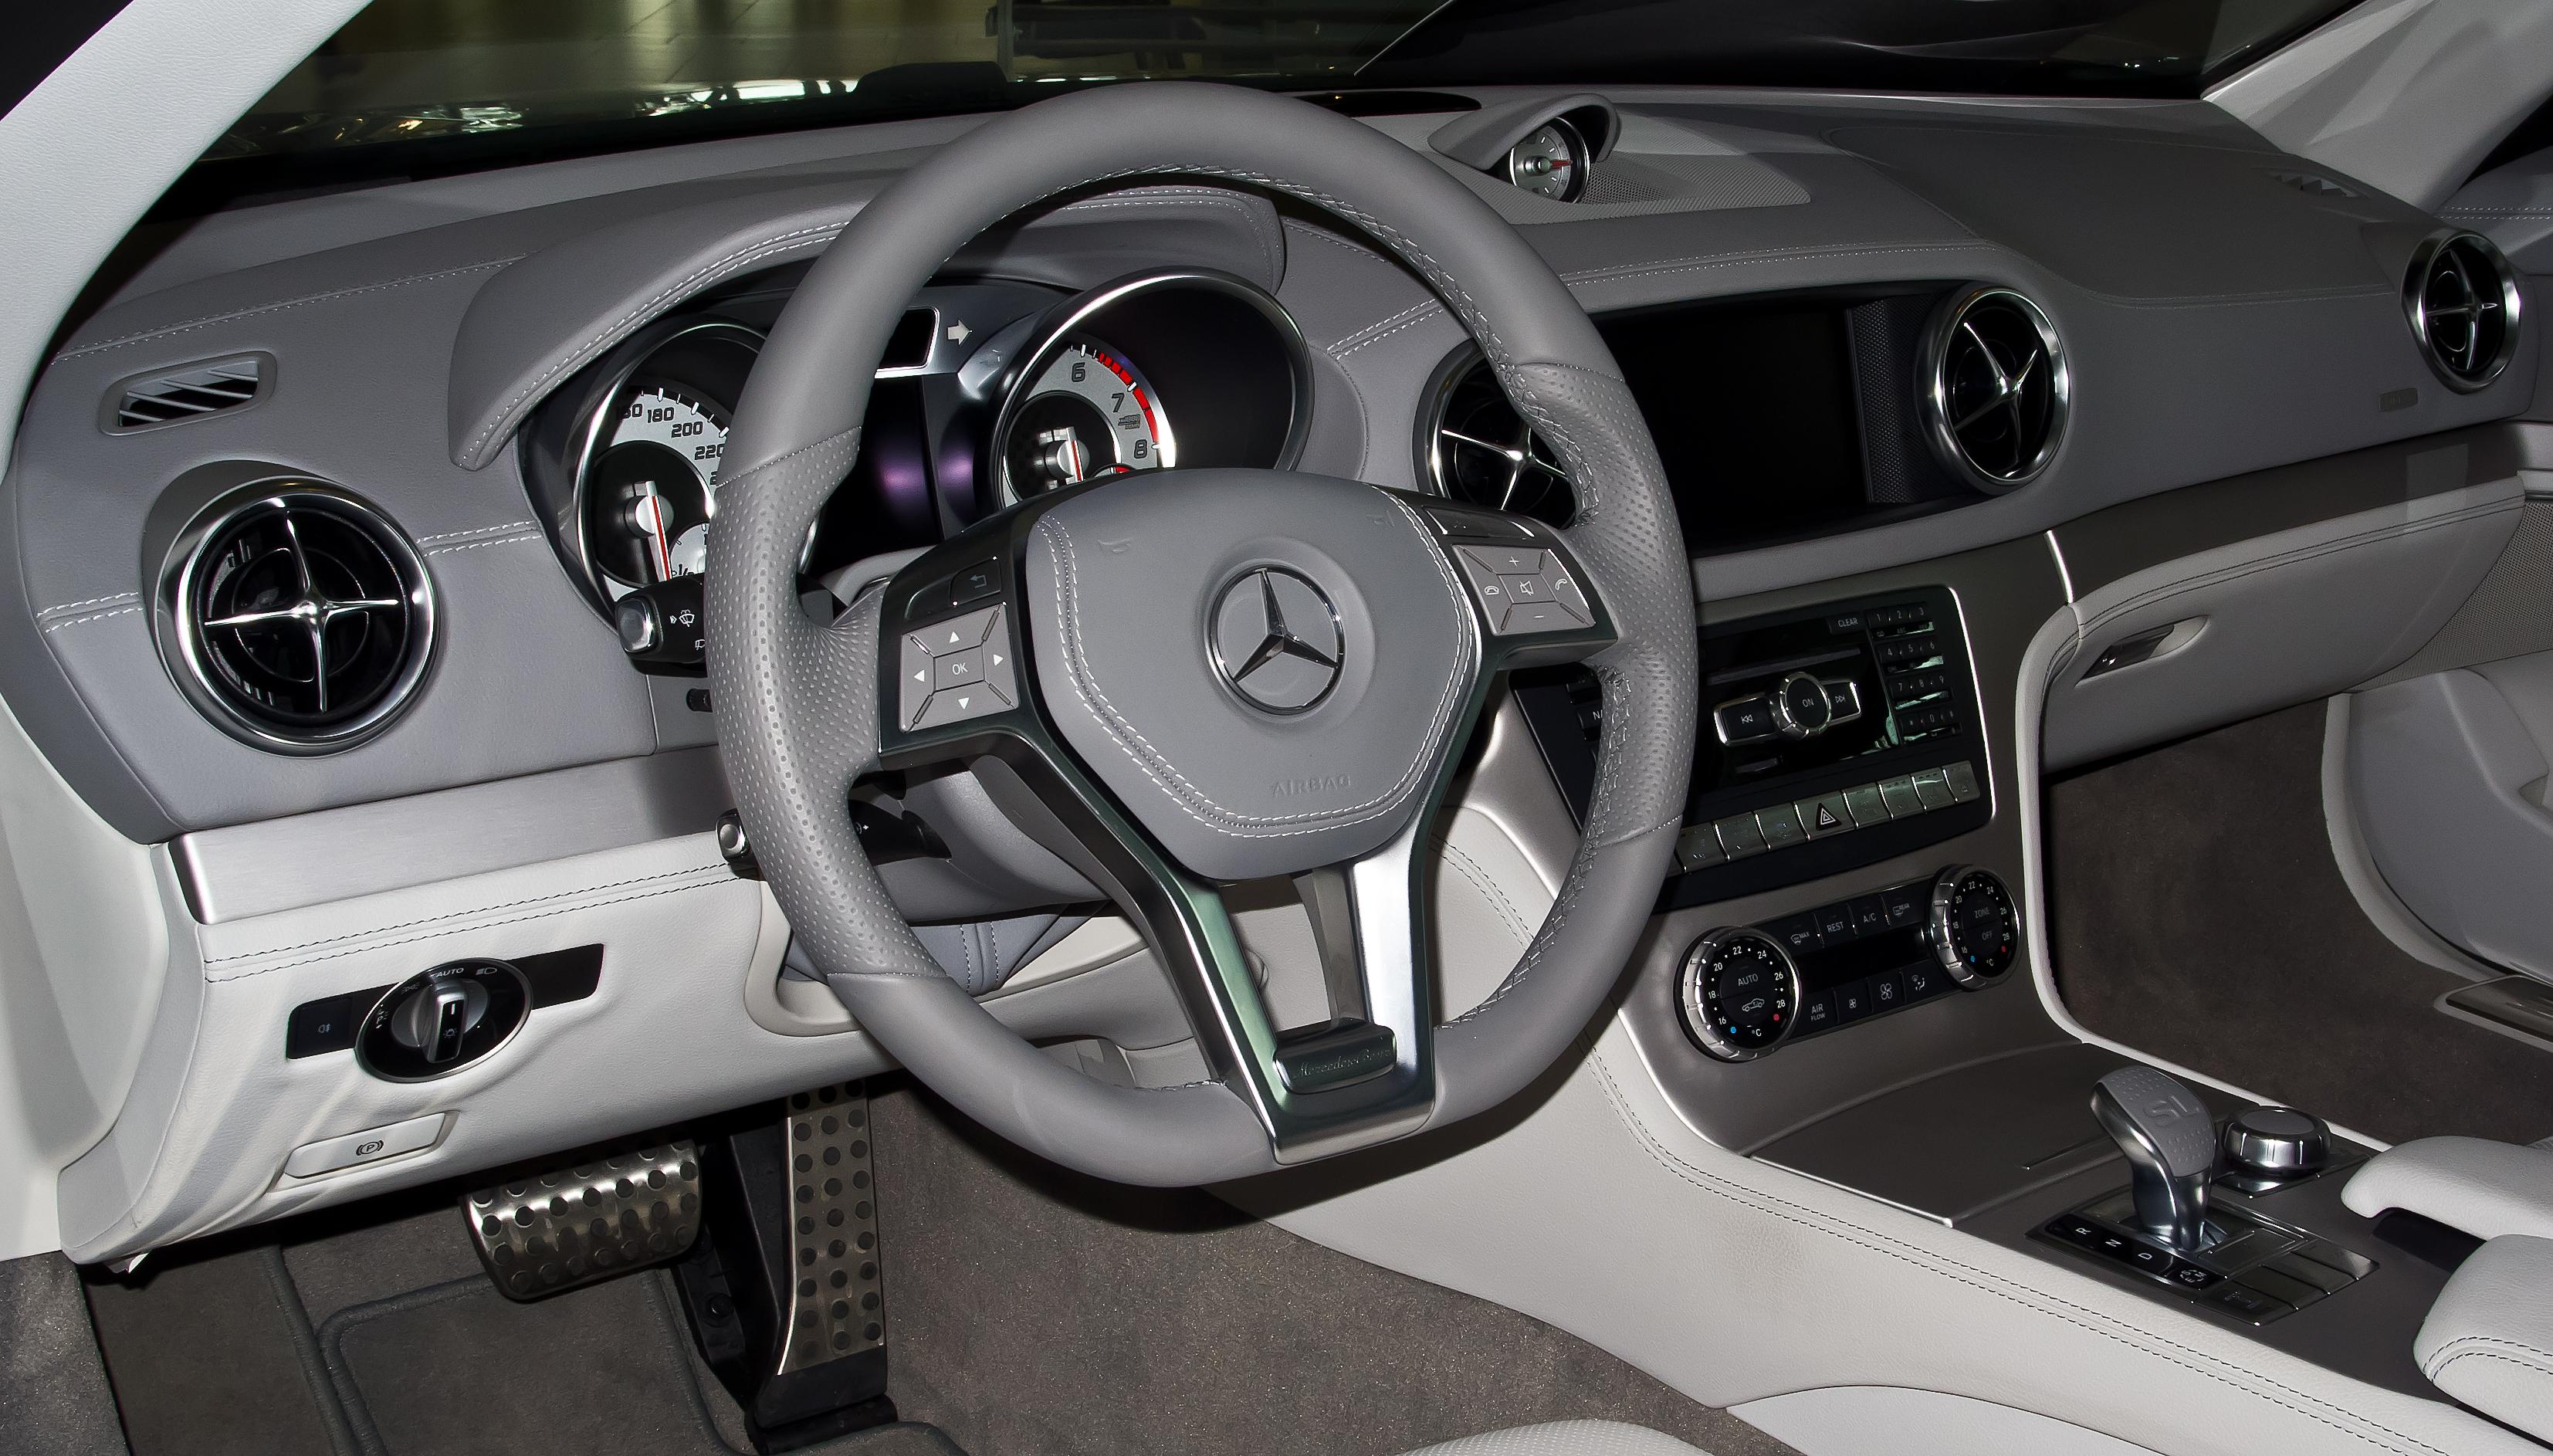 Mercedes Benz Sl >> File:Mercedes-Benz SL 350 (R 231) – Innenraum (1), 13. April 2013, Düsseldorf.jpg - Wikimedia ...